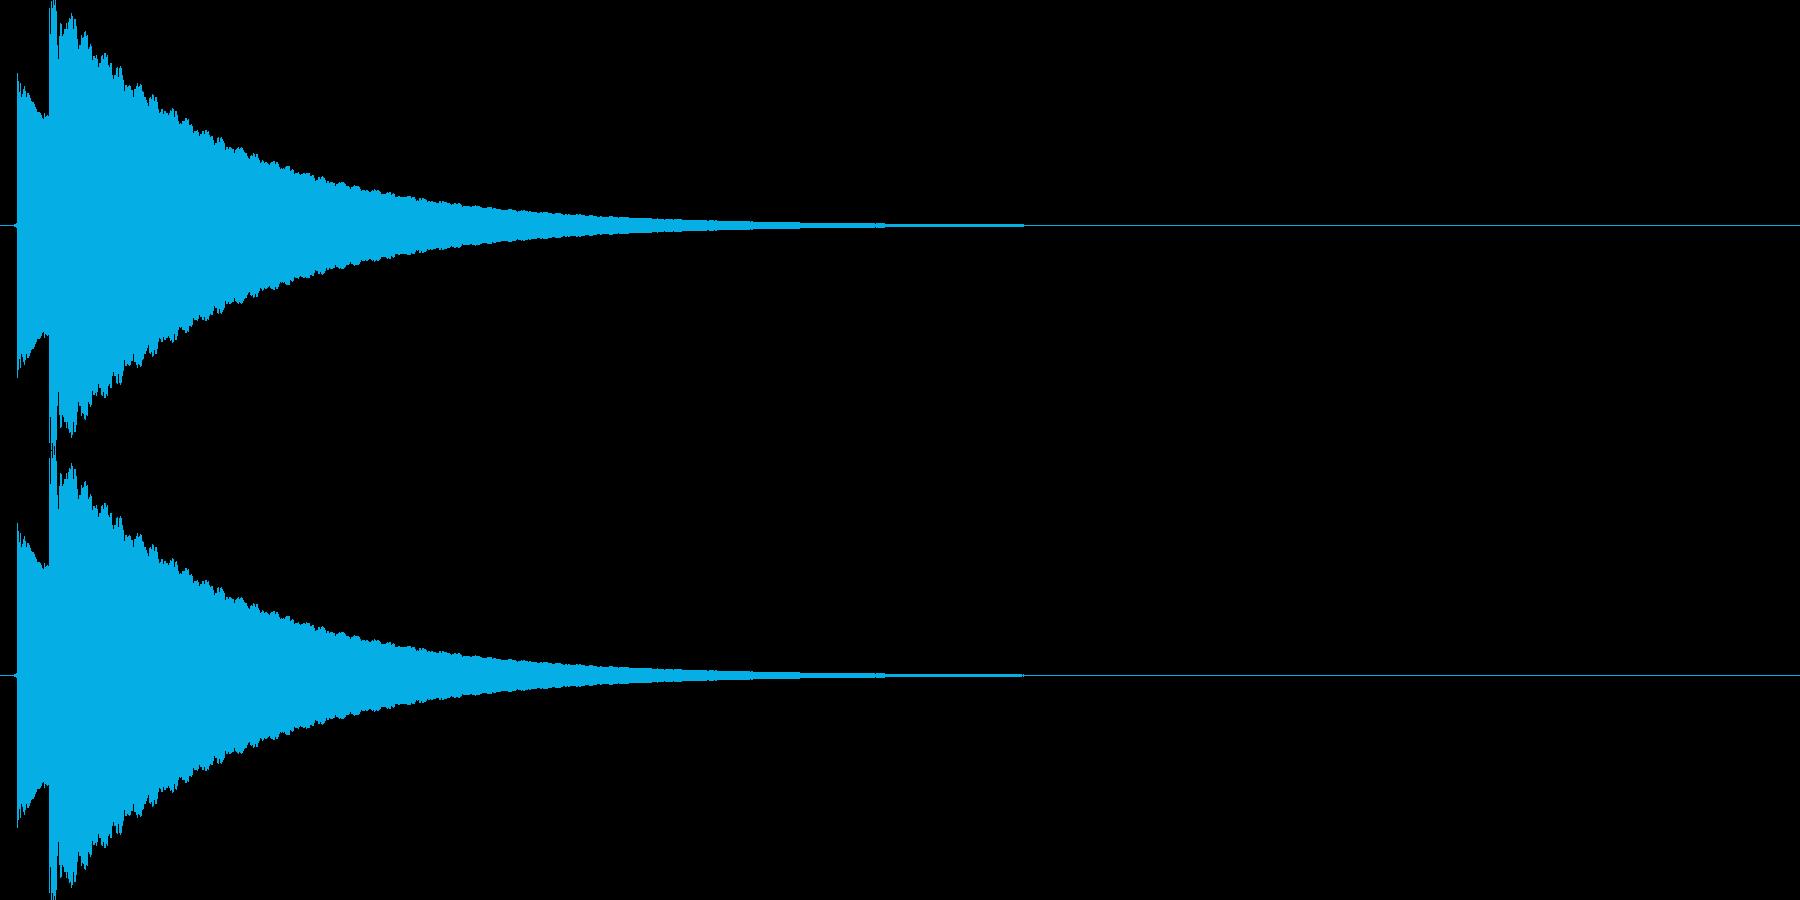 【SE】ピキーン02(コーラス)の再生済みの波形